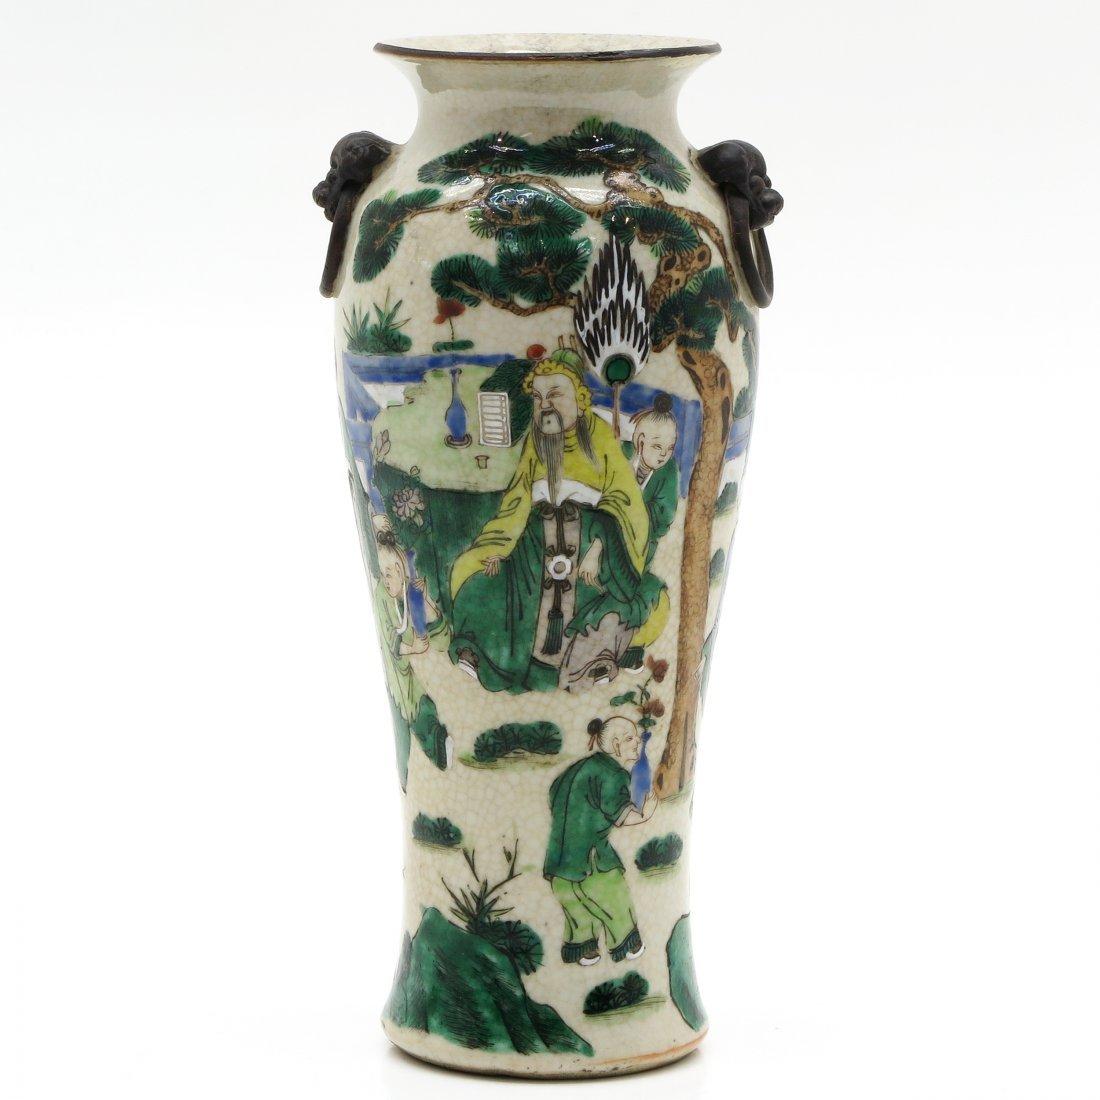 China Porcelain Famille Verte Decor Nanking Vase